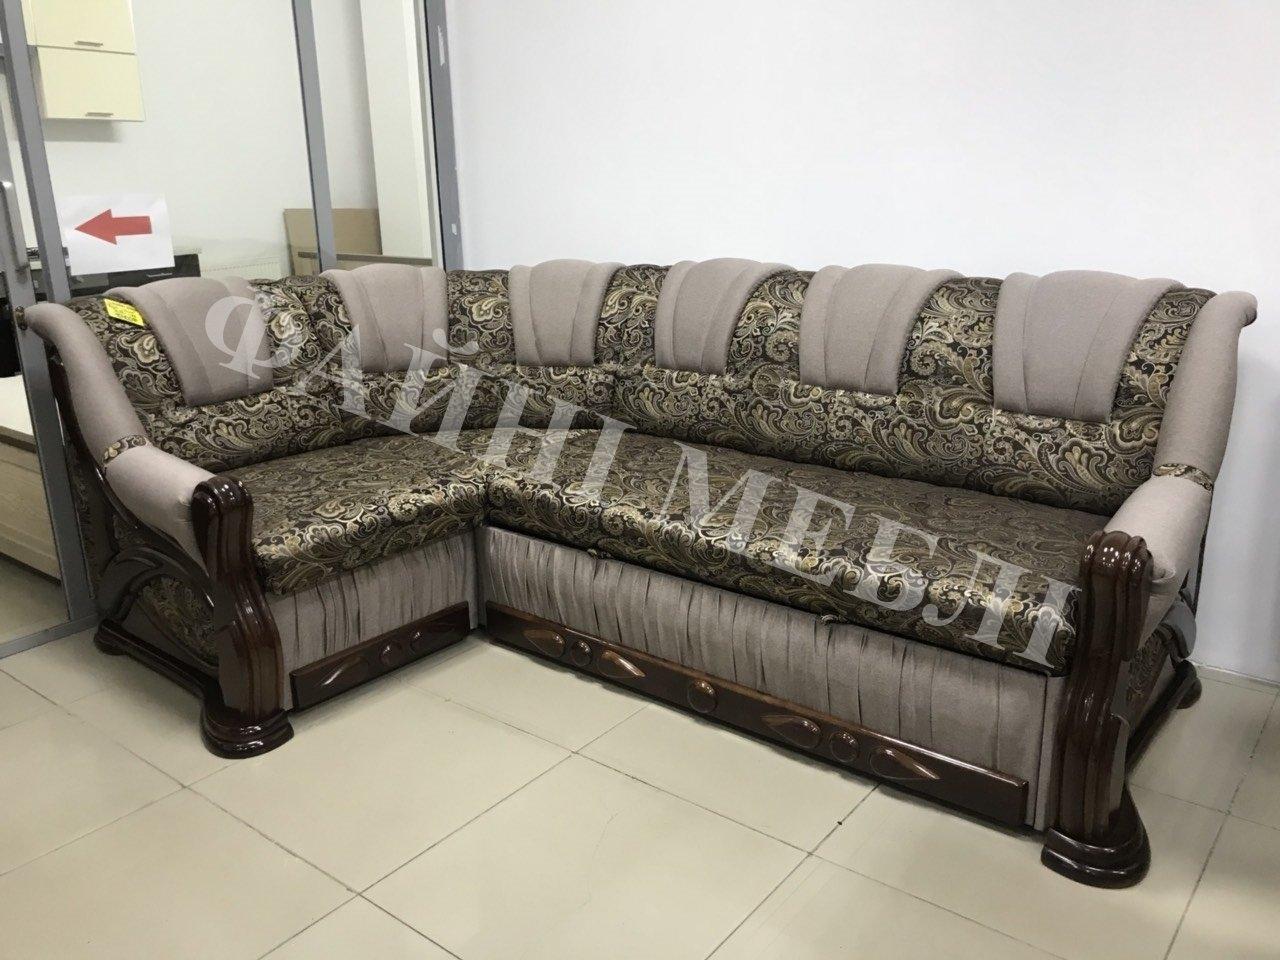 Угловой диван Шик 6